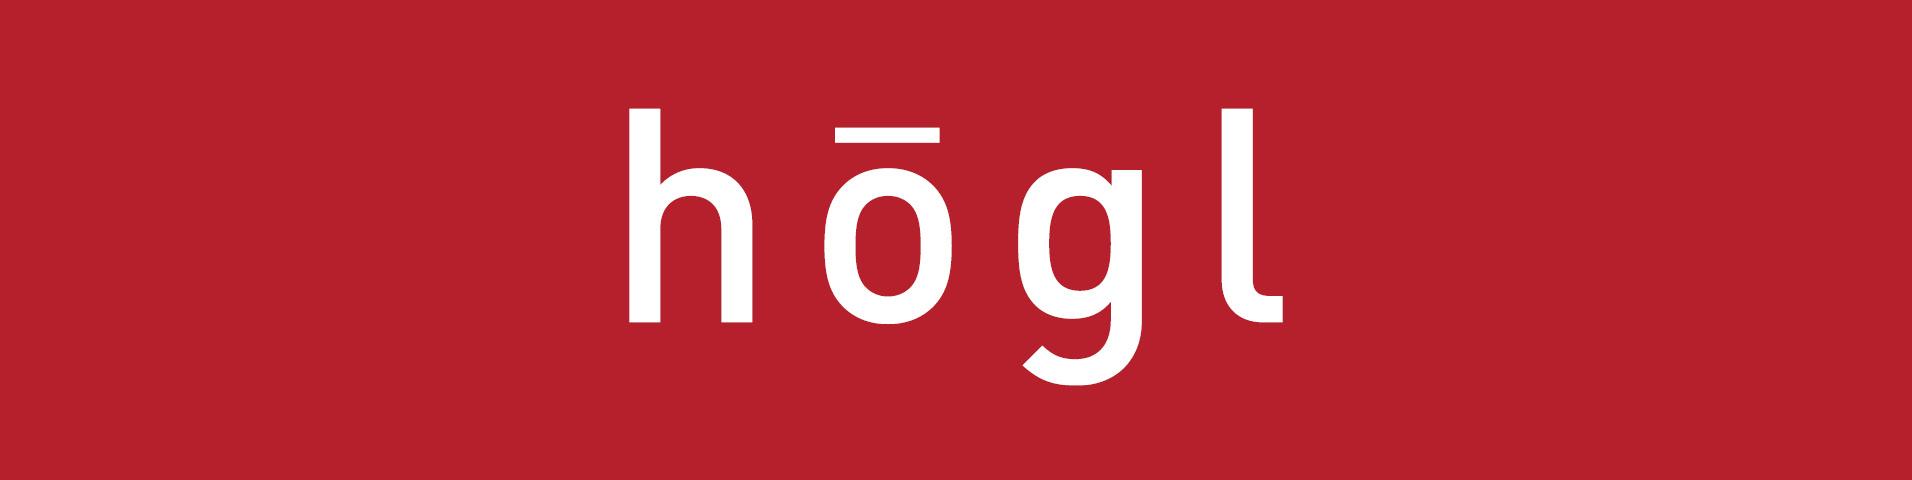 4edbc13a7f7 Högl | Buy Högl online on Zalando